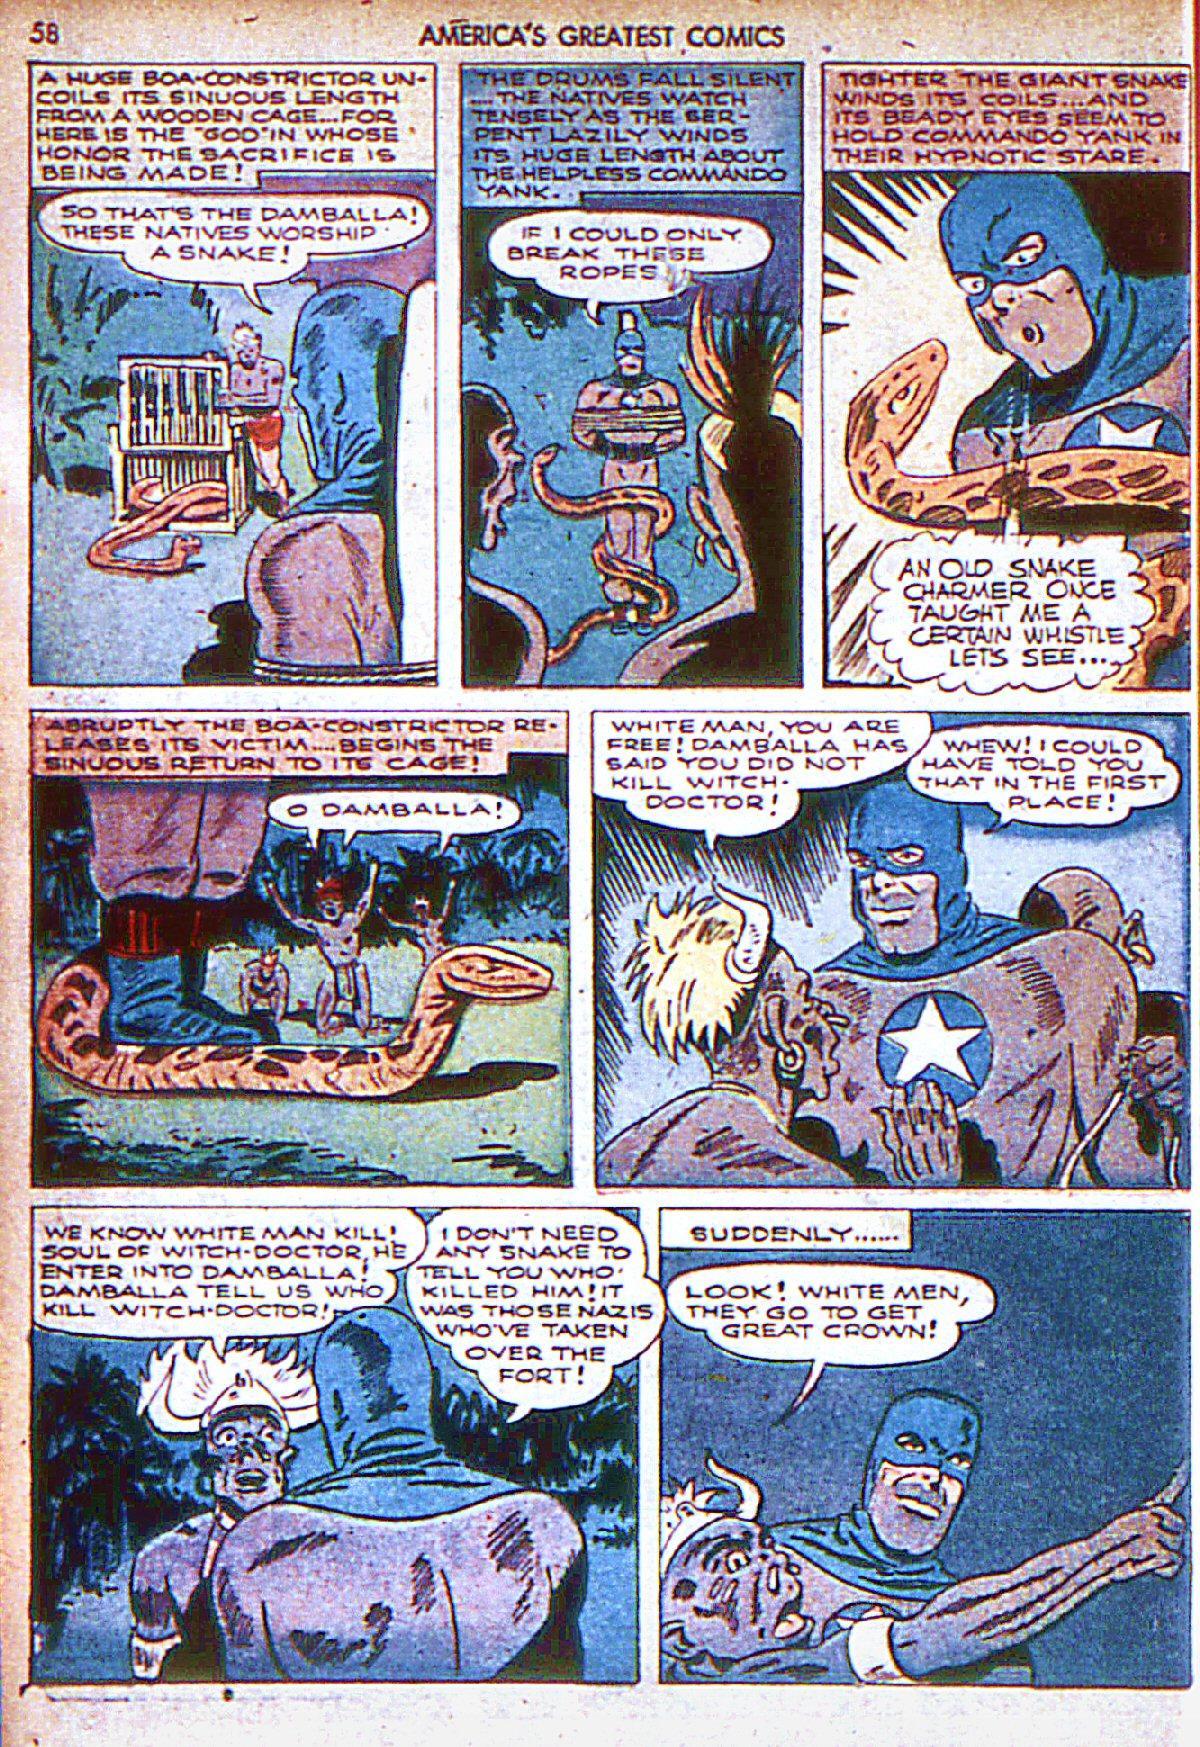 Read online America's Greatest Comics comic -  Issue #6 - 59